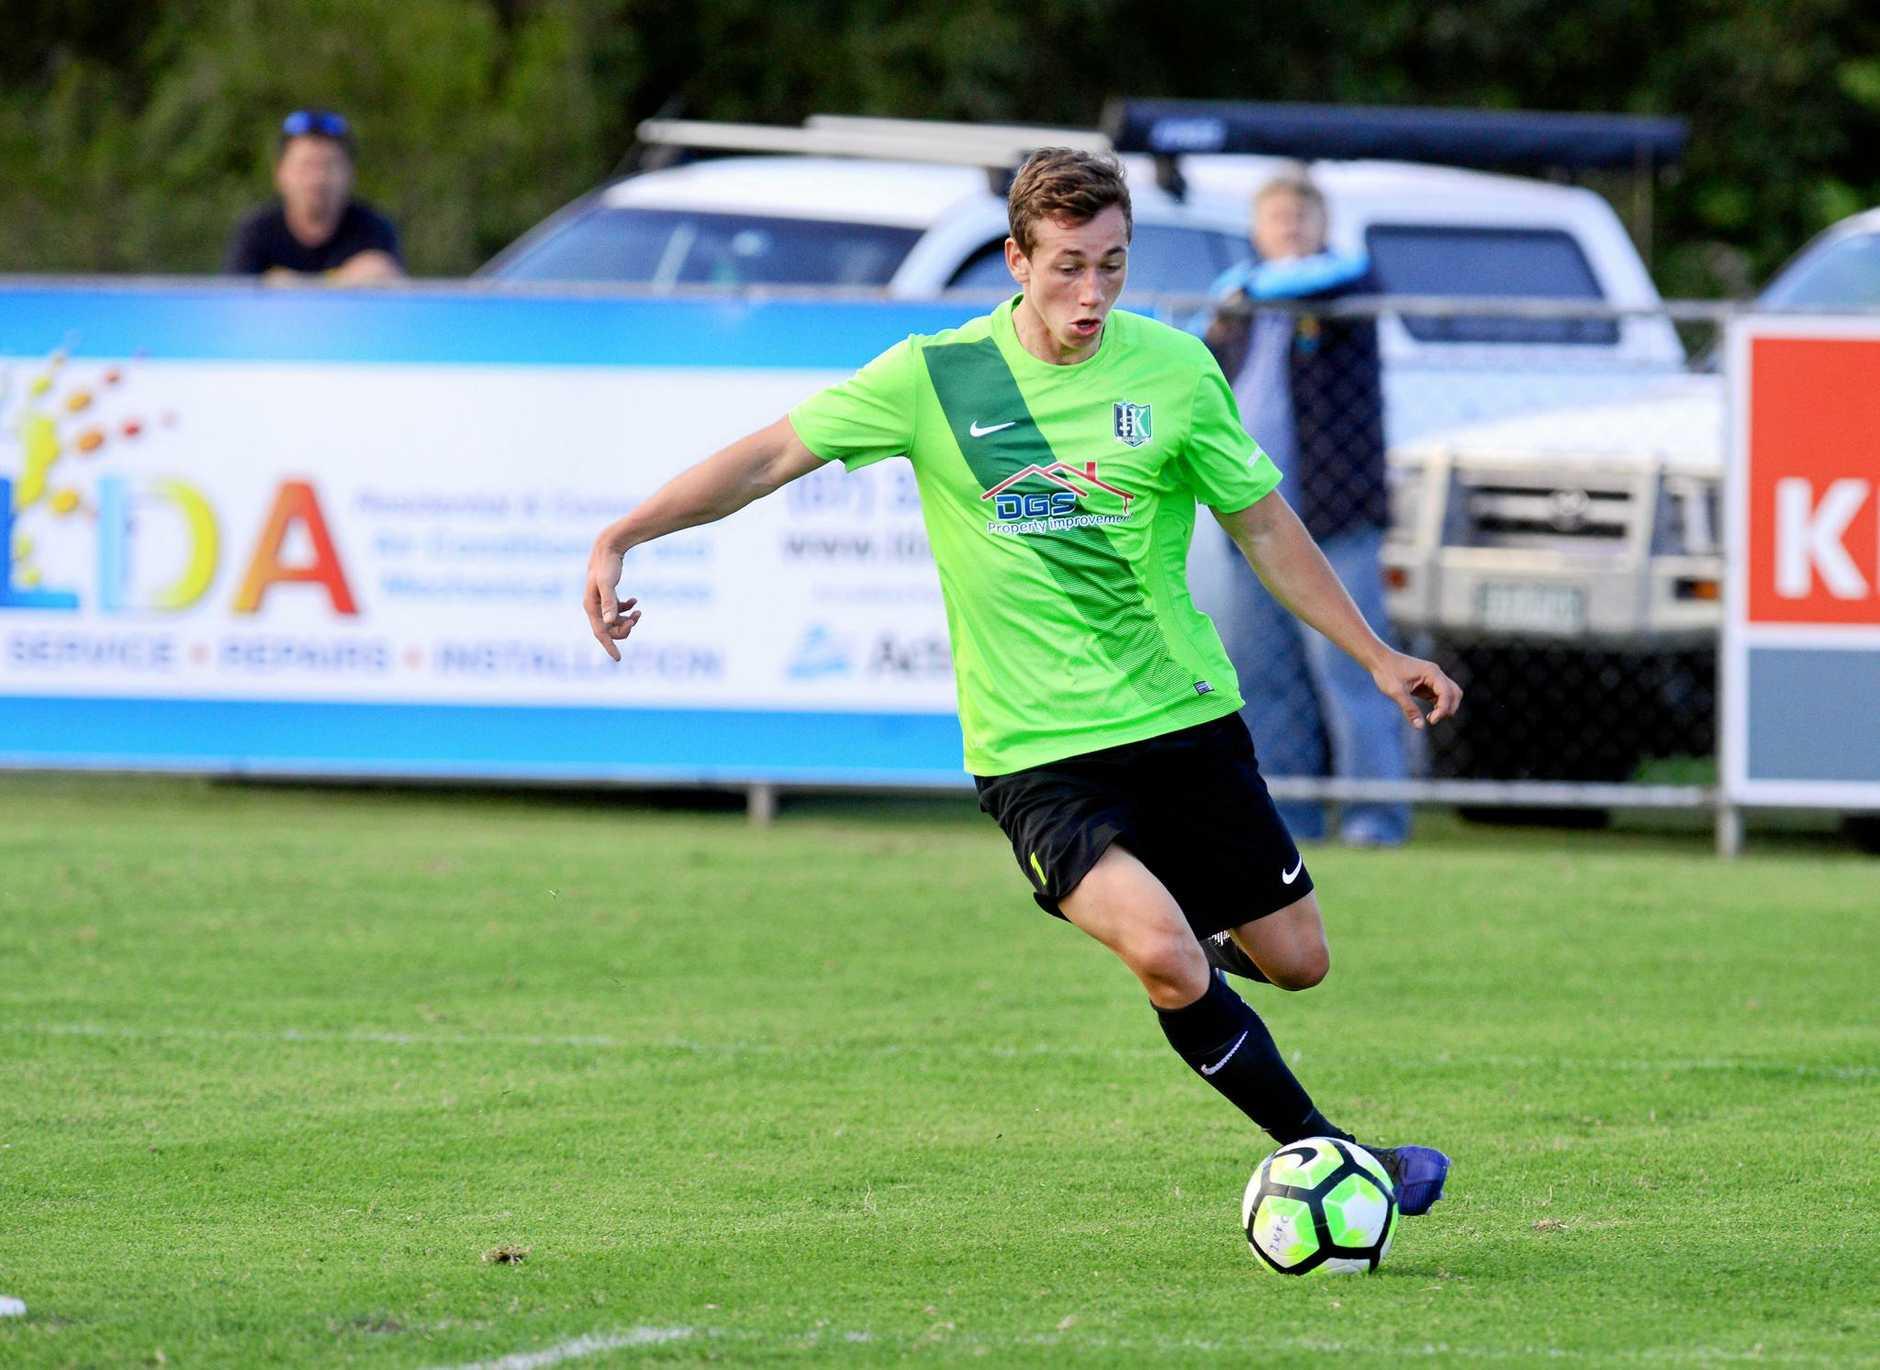 Ipswich Knights goal scorer Elliot White.